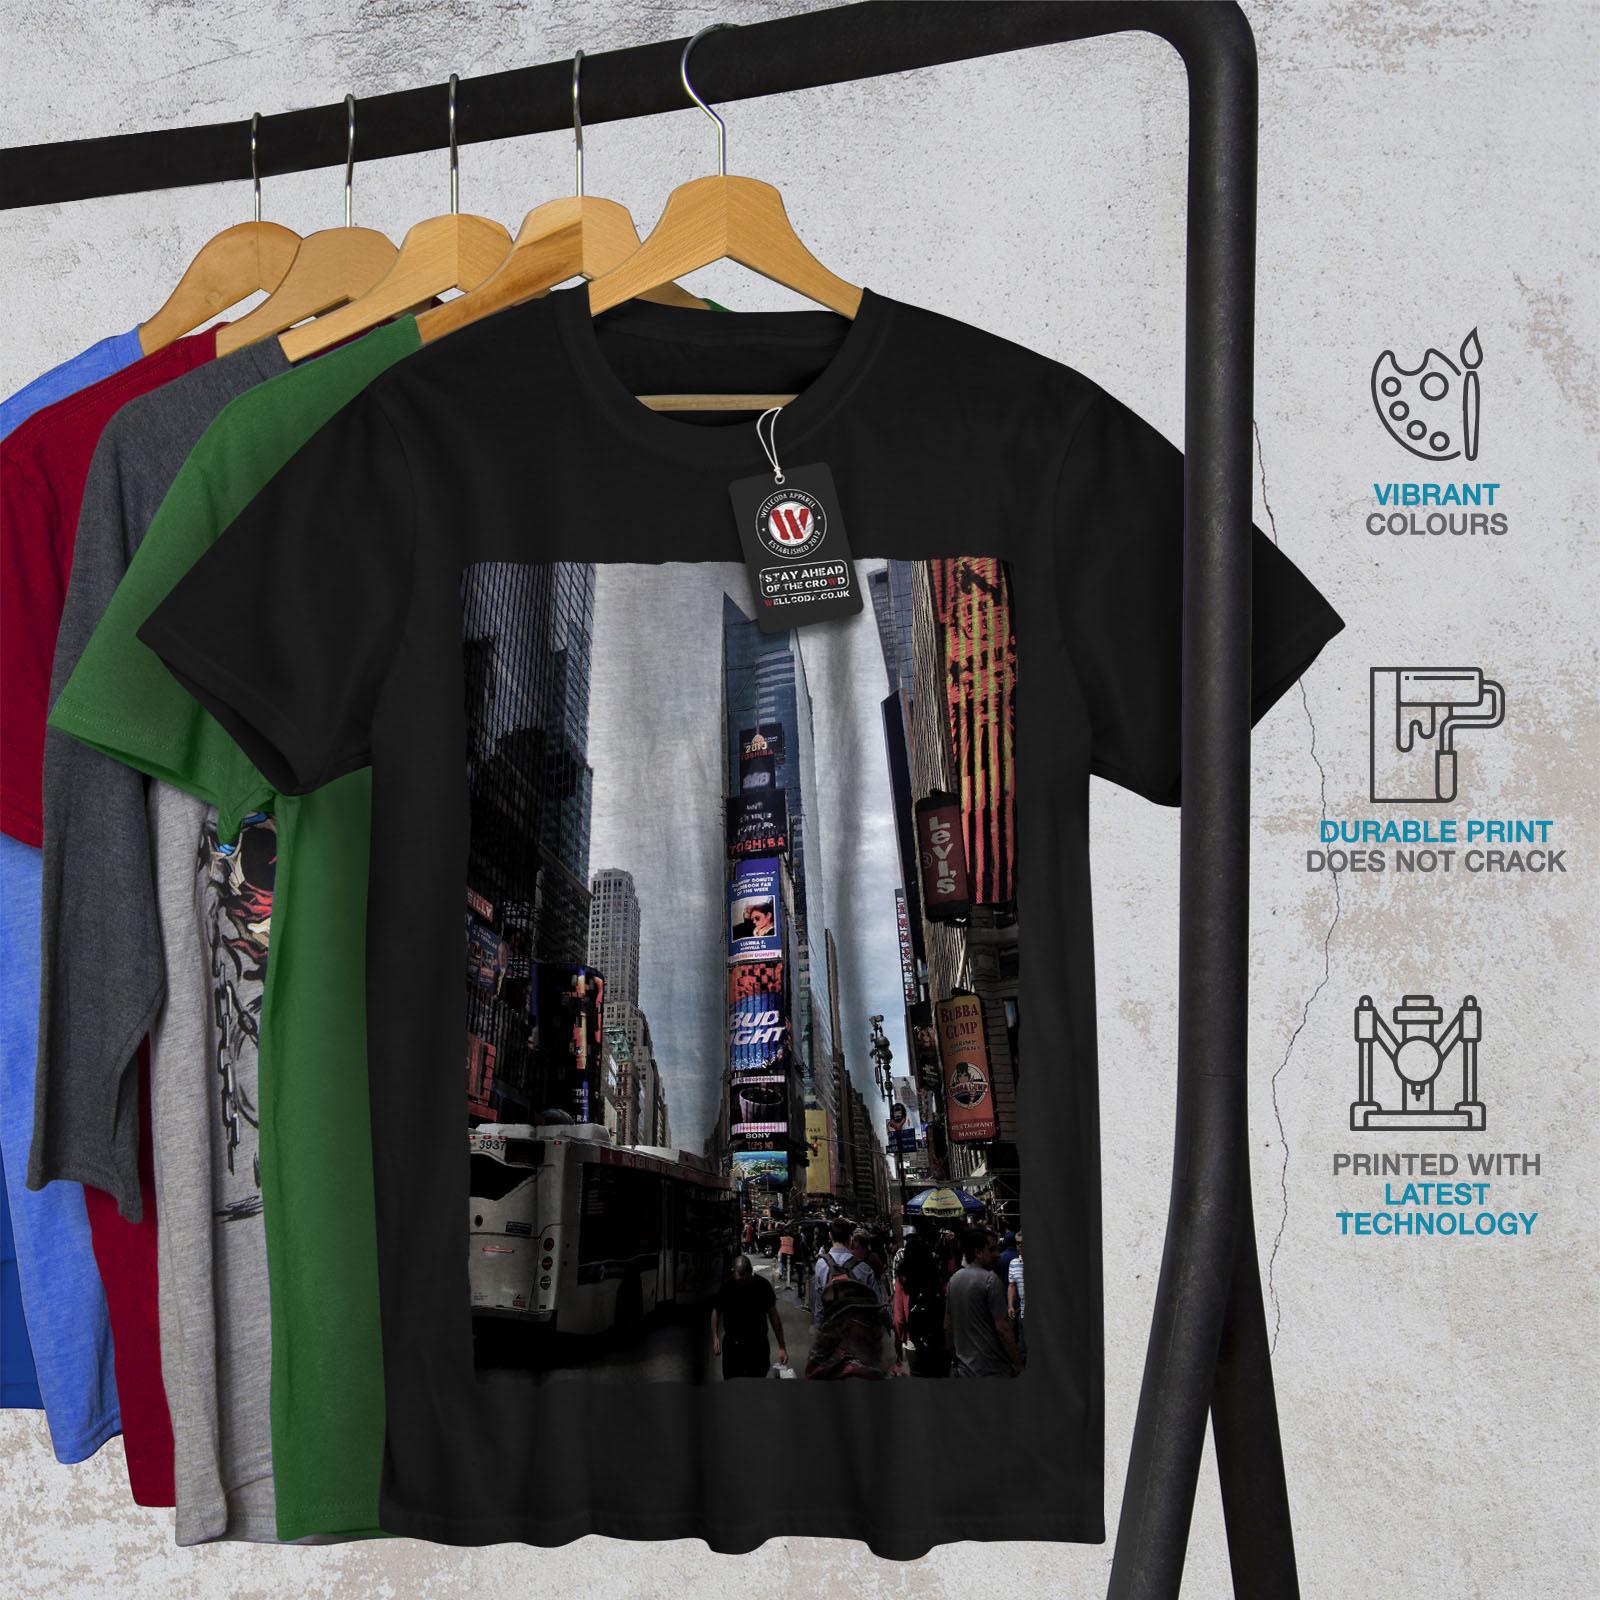 Wellcoda USA Times Square Fashion Mens T-shirt USA Graphic Design Printed Tee